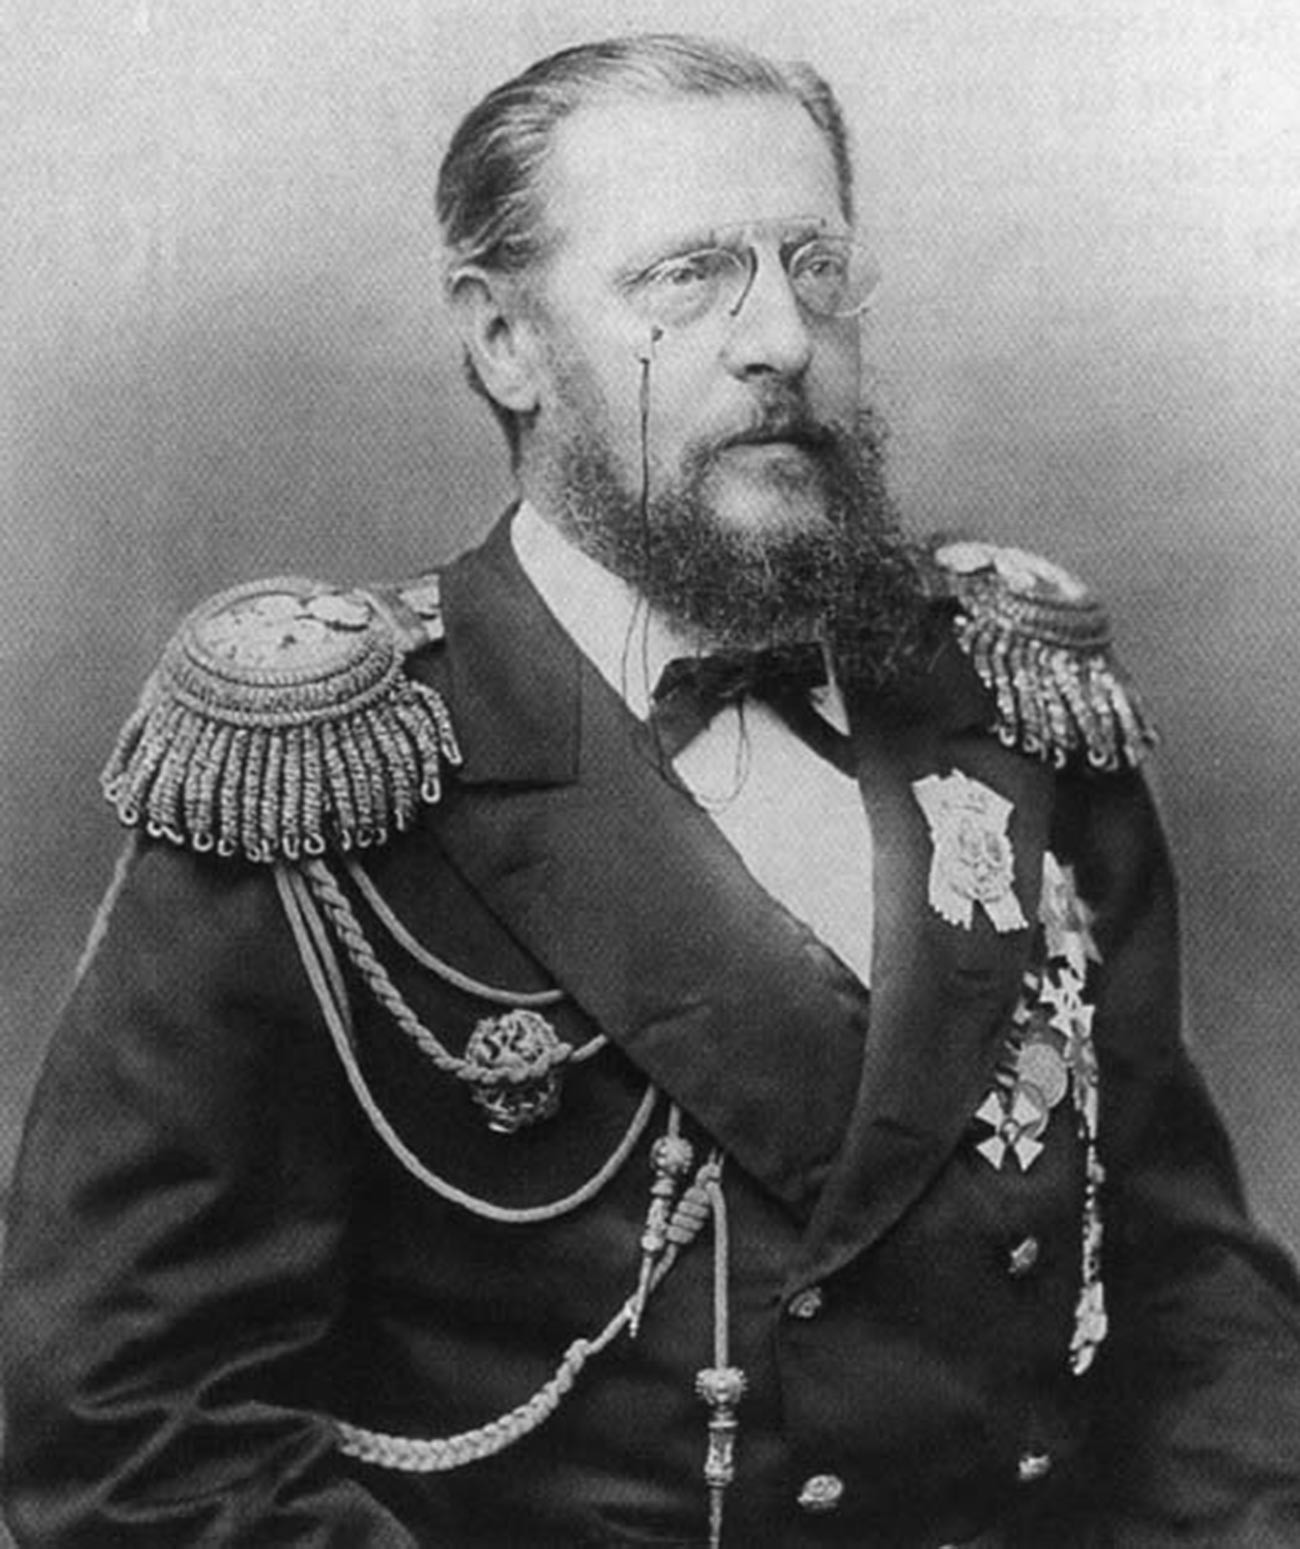 Großfürst Konstantin Nikolajewitsch, Nikolaus' Vater